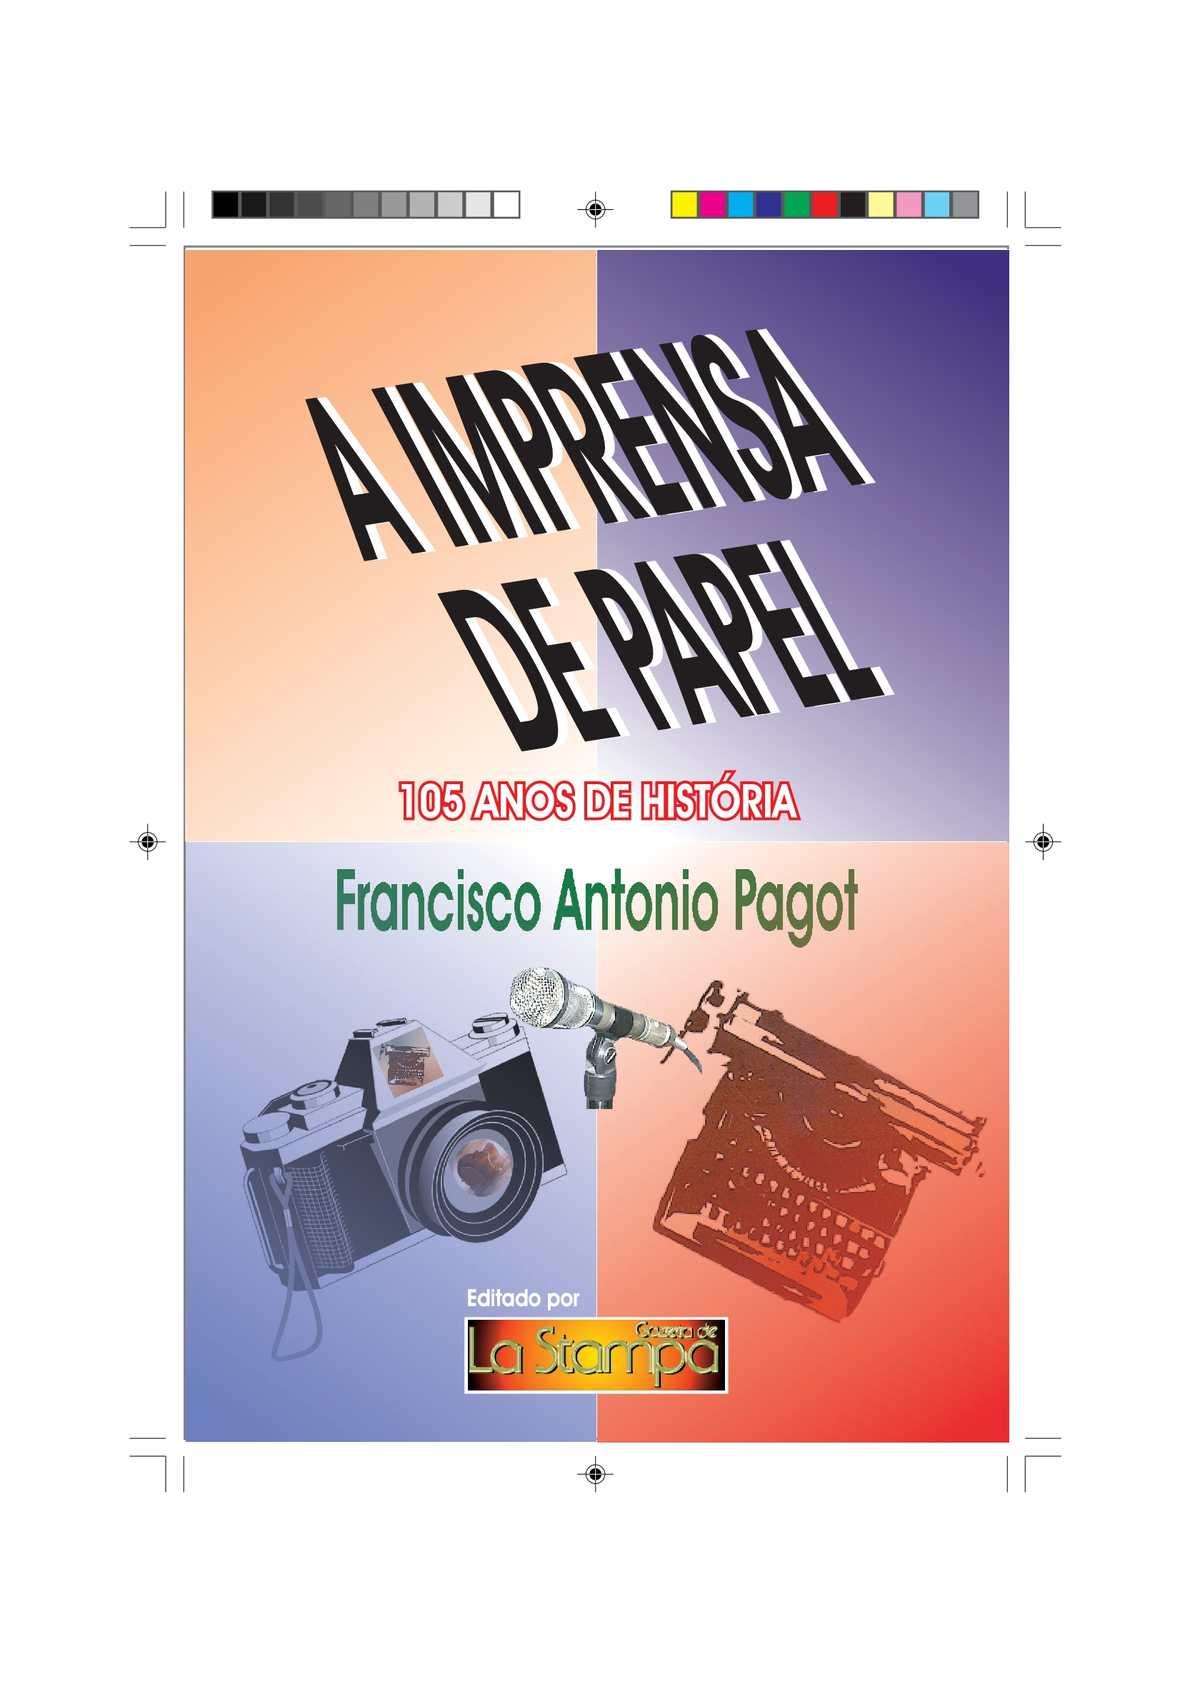 dbaff712d98a1 Calaméo - A Imprensa De Papel 13 04 2015